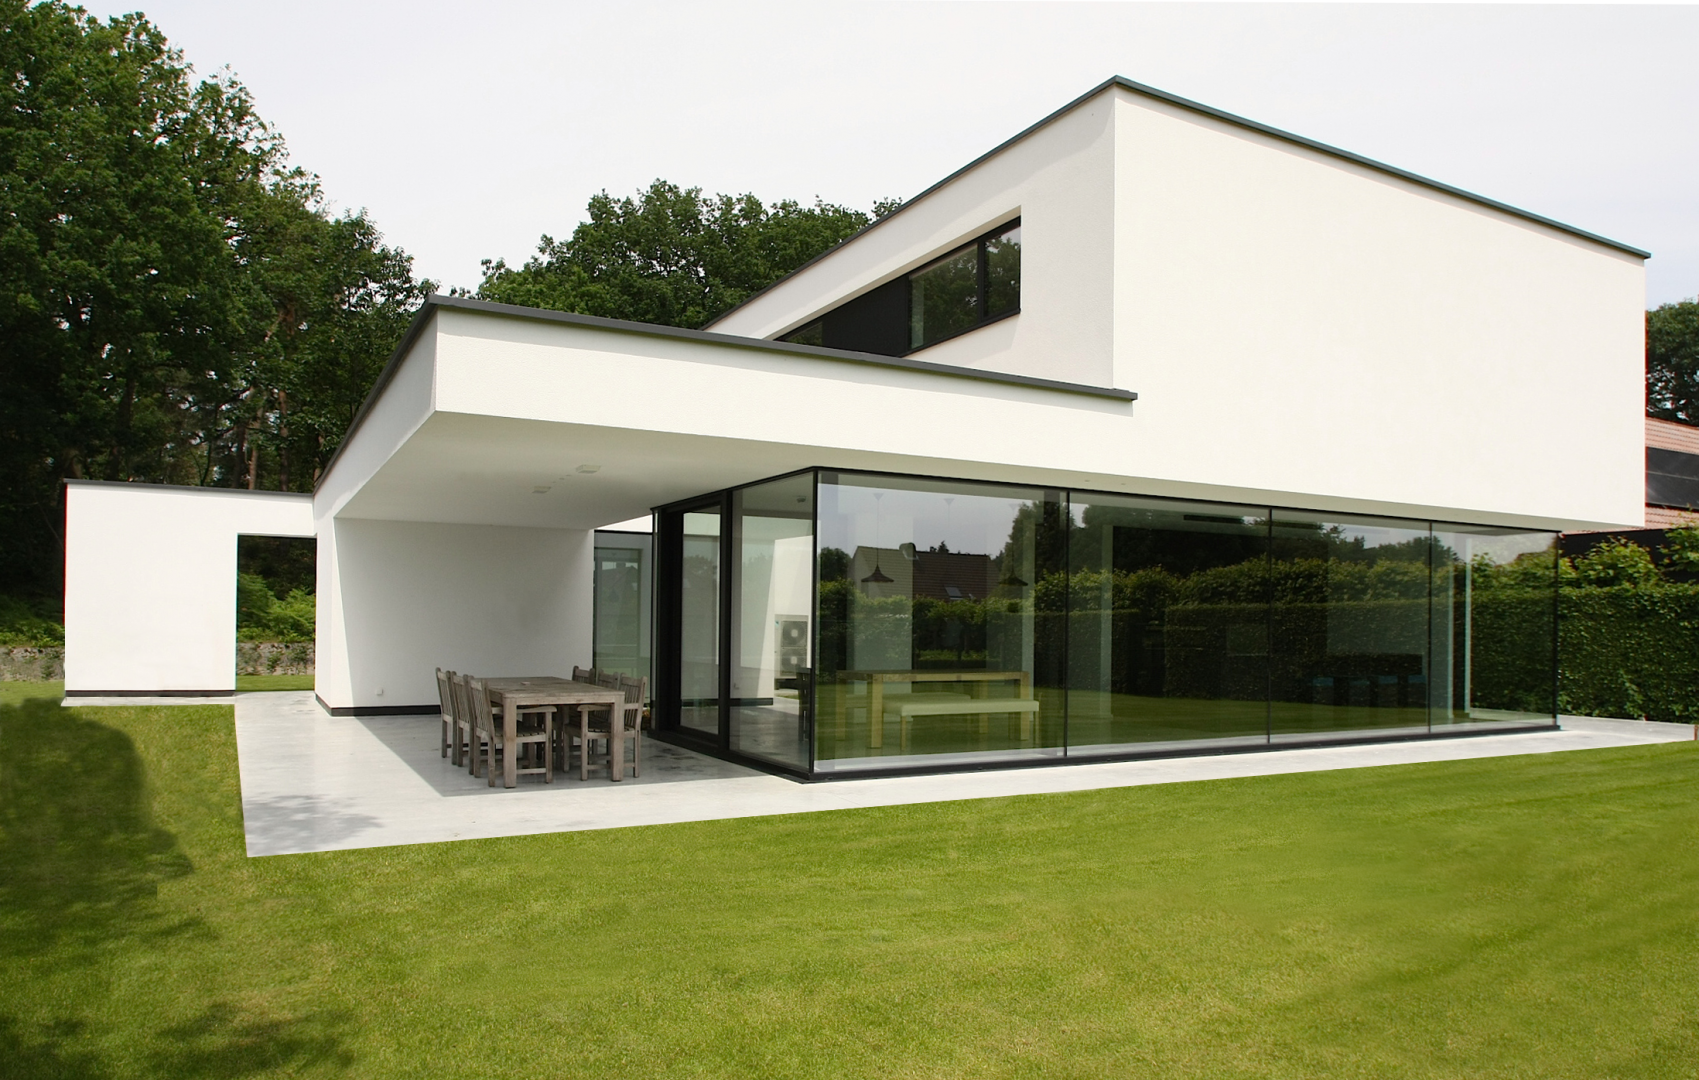 Woning b v grobbendonk concrete house architectuur for Moderne villa architectuur